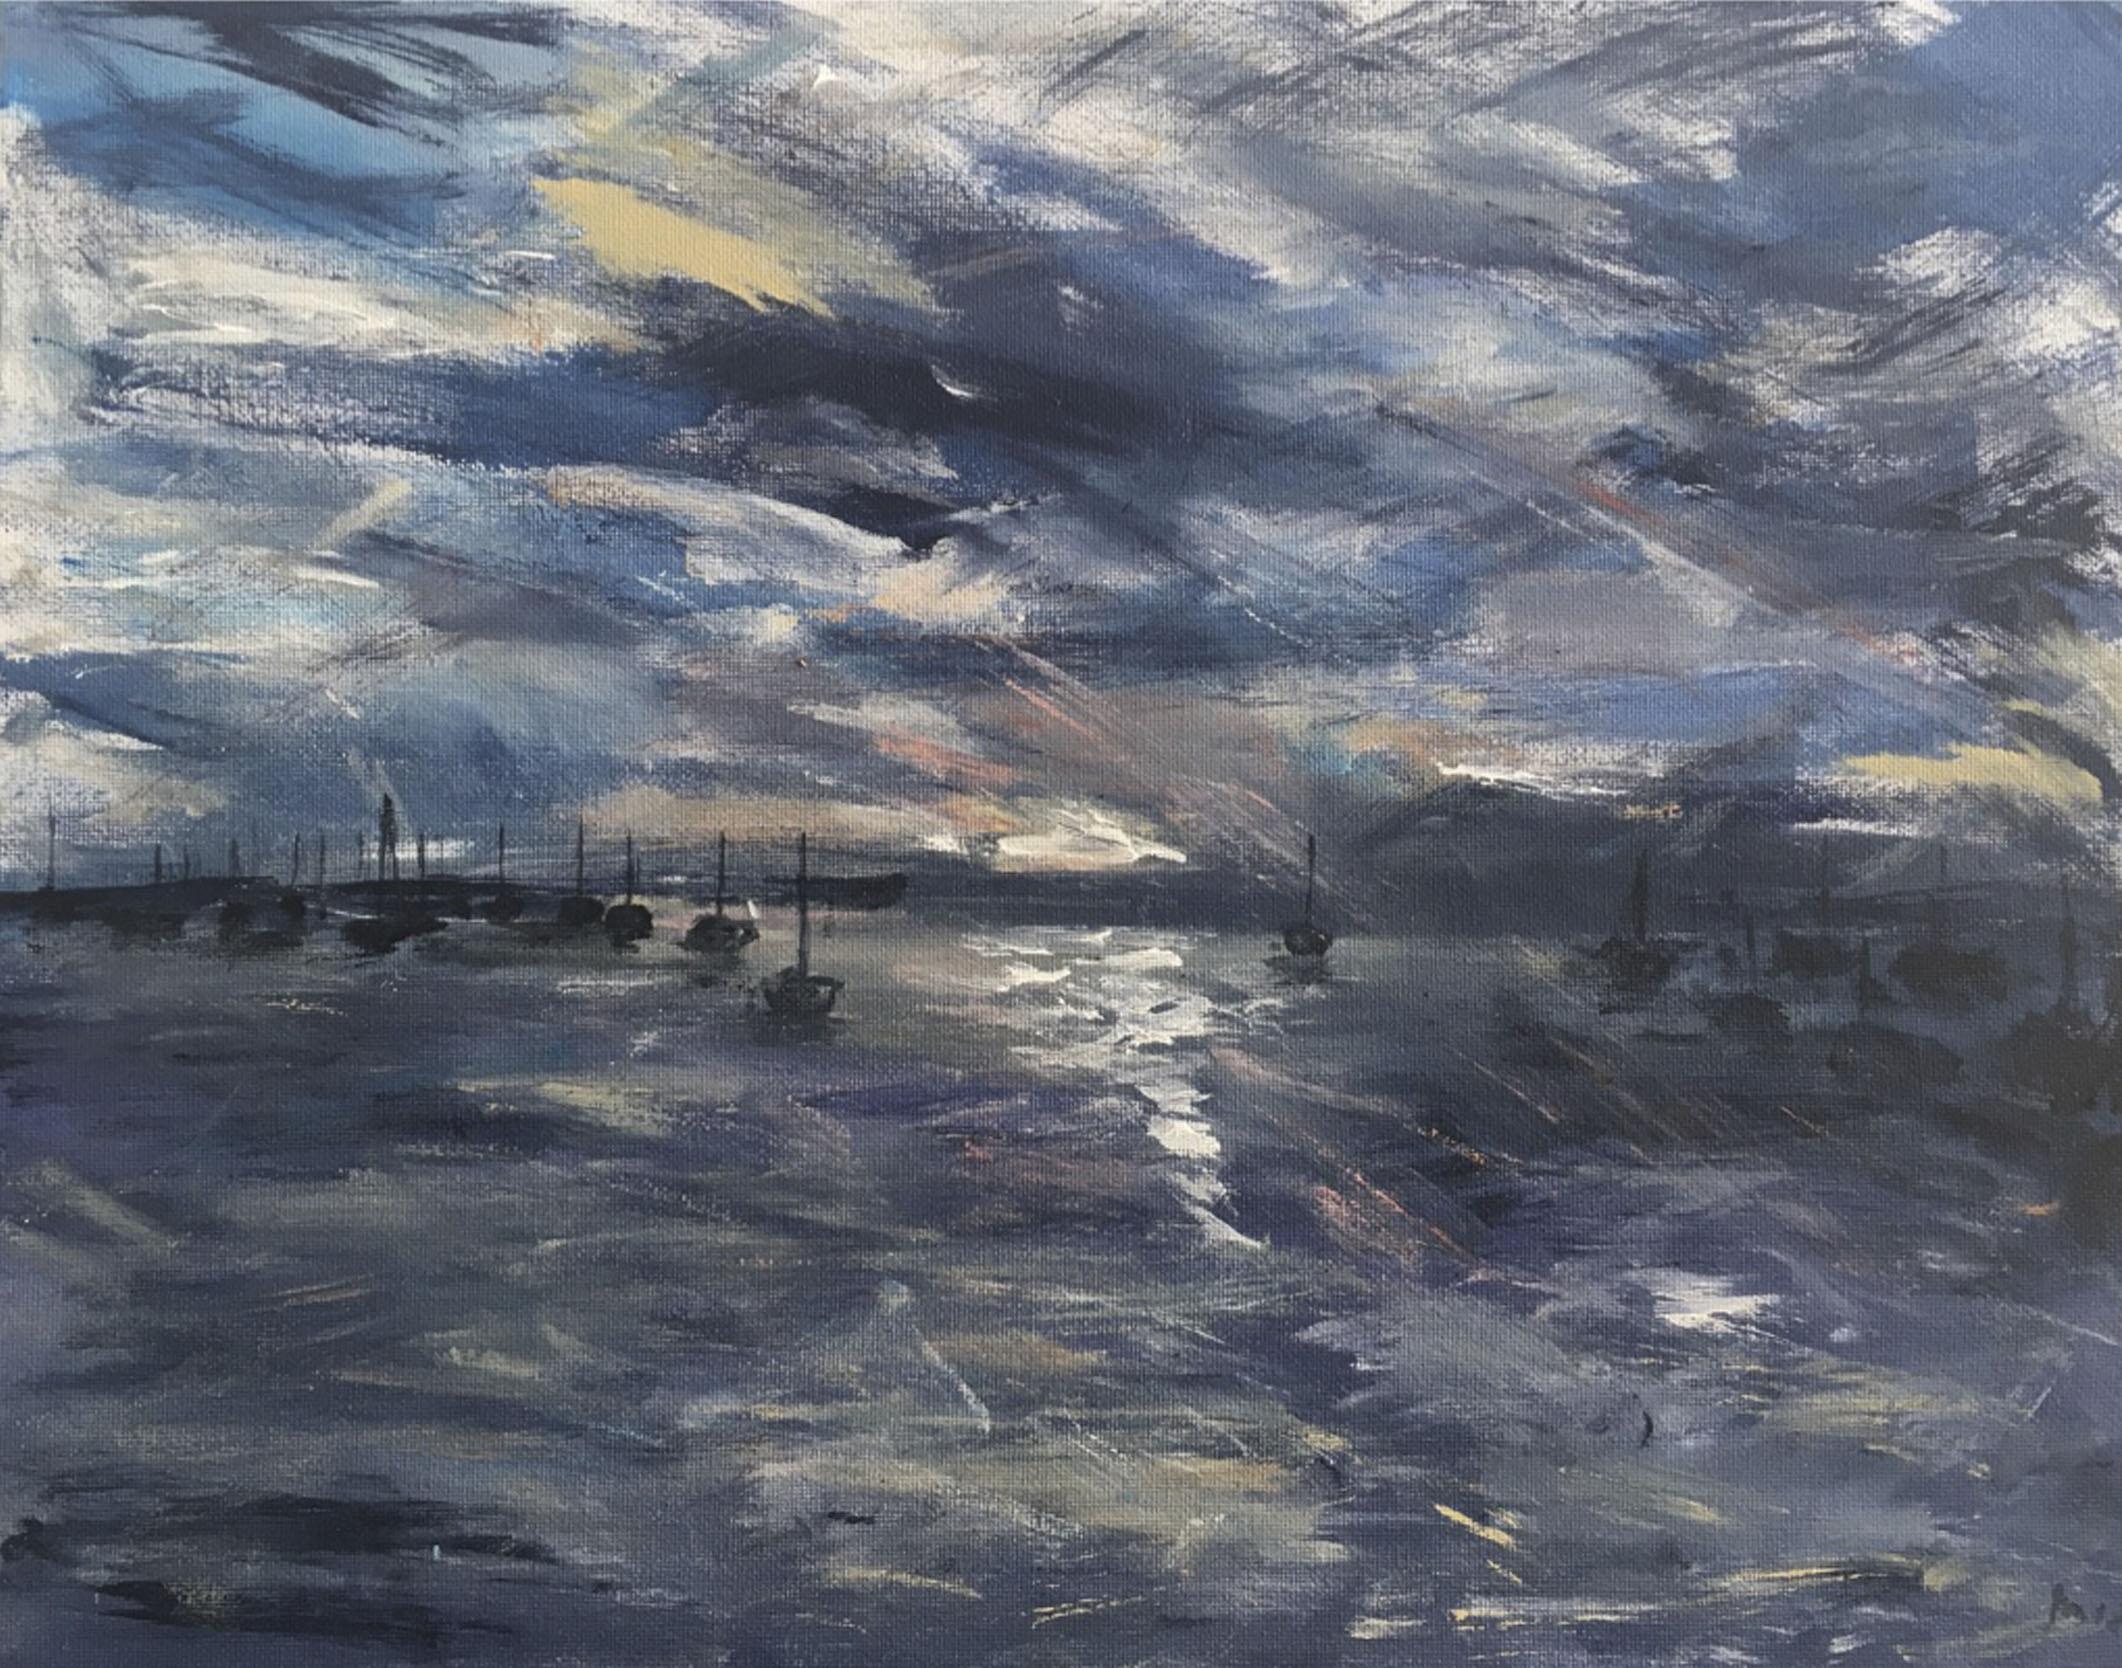 Estuary Nighttime (sold)